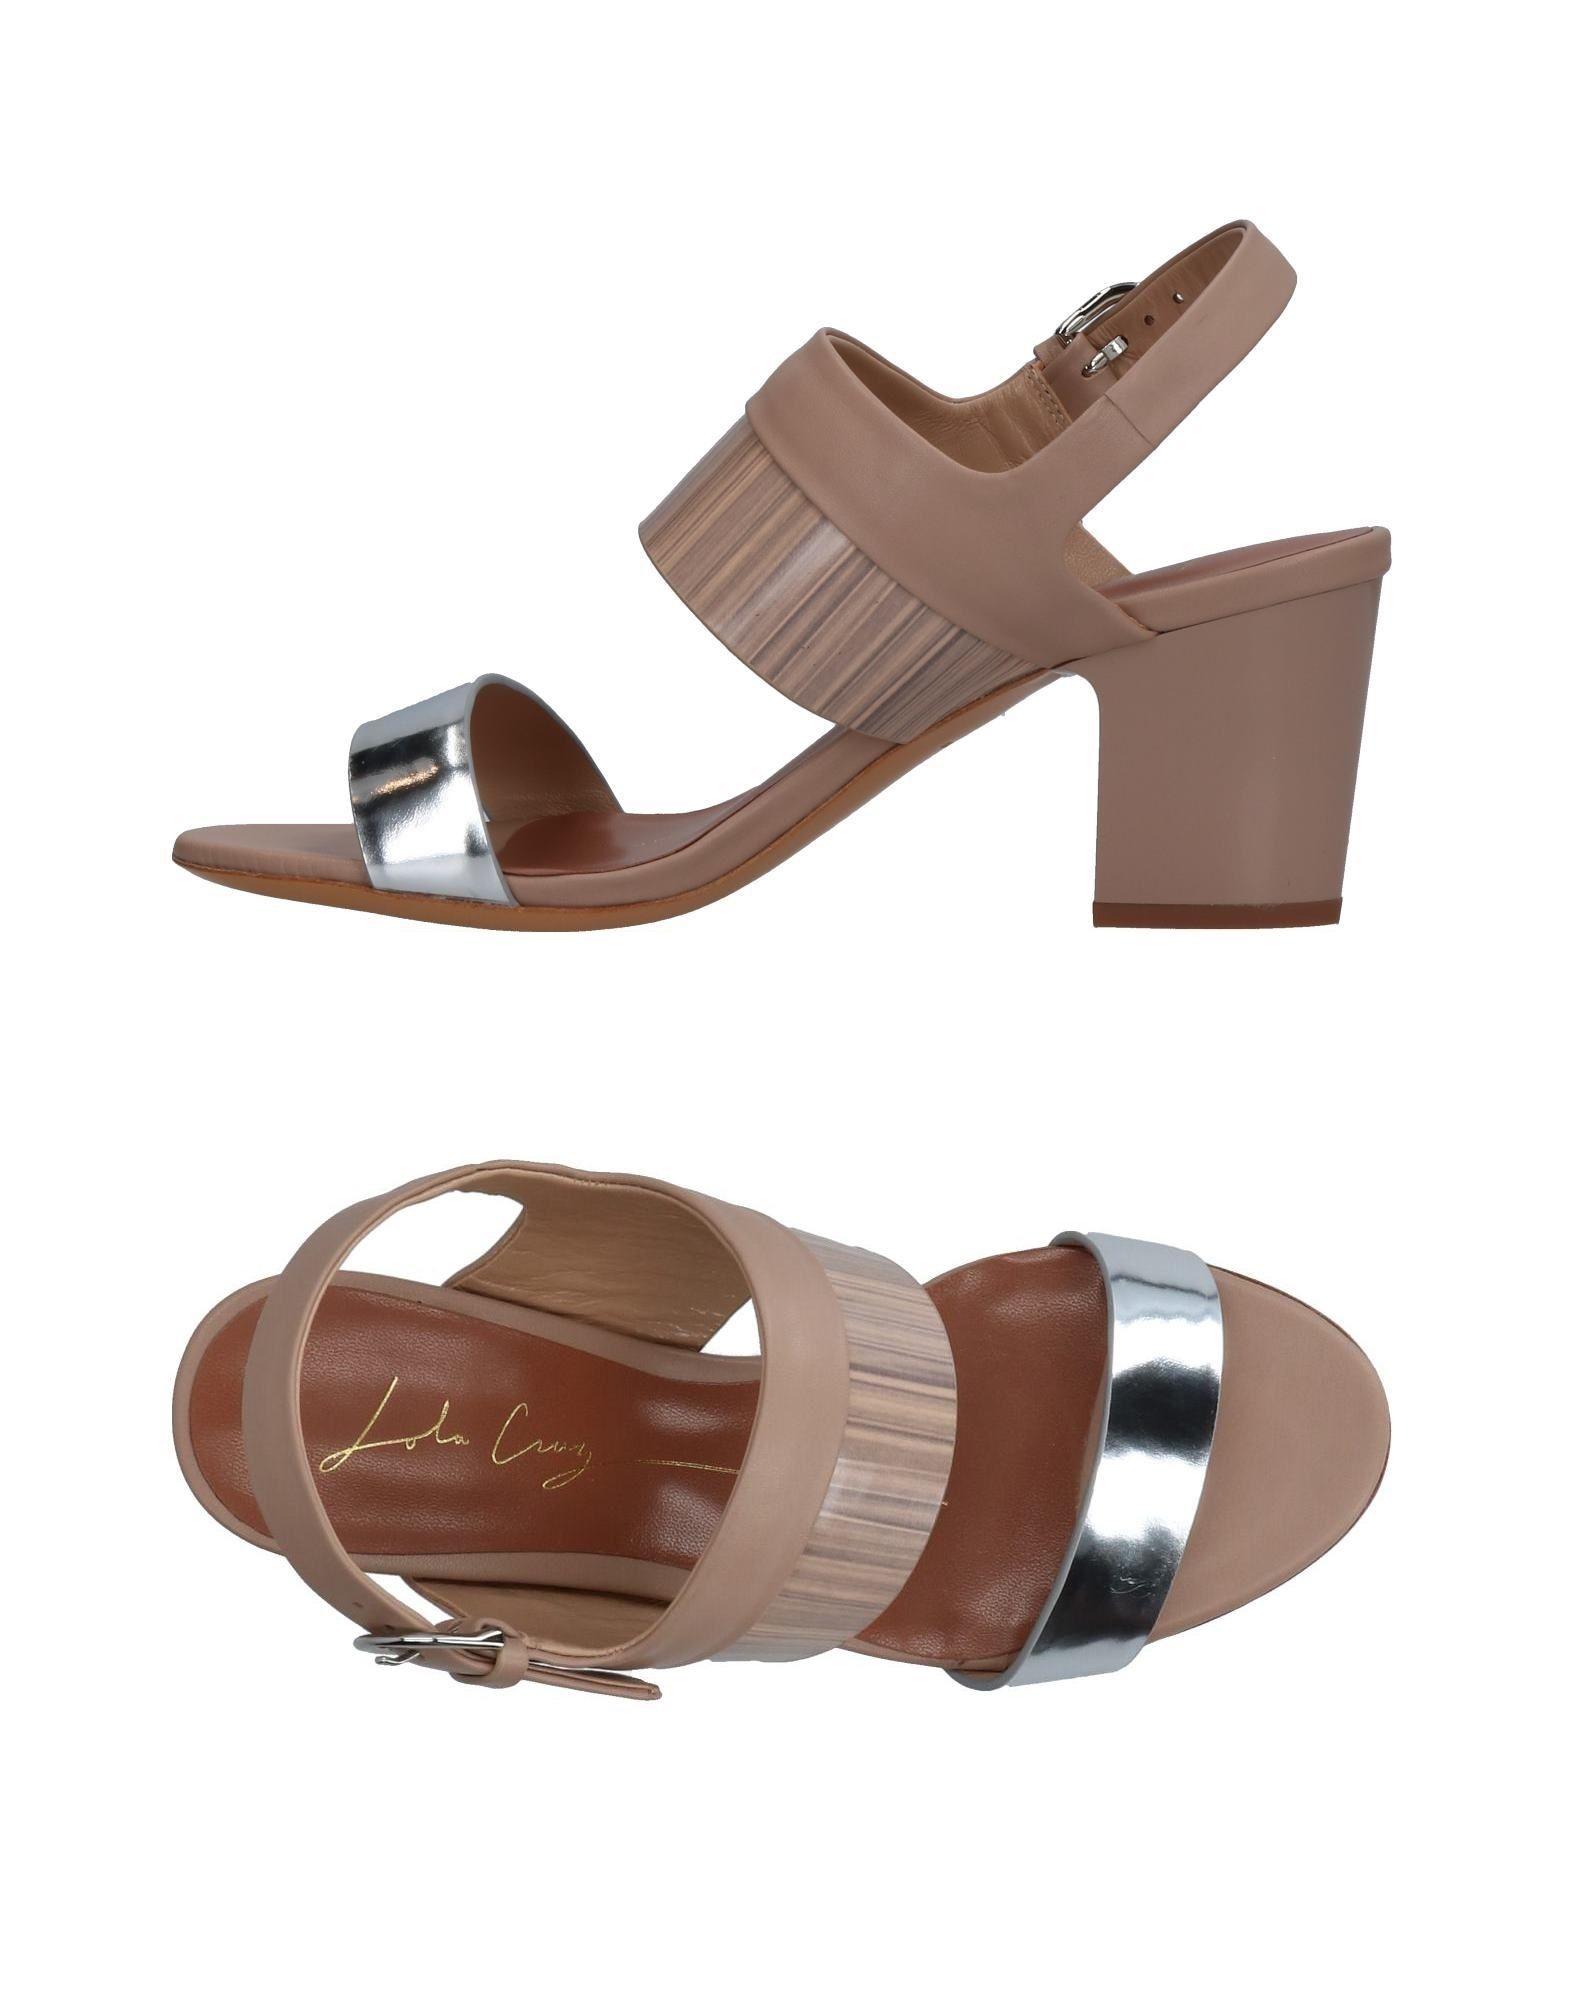 Lola Cruz Sandalen Damen  11345769FX Gute Qualität beliebte Schuhe